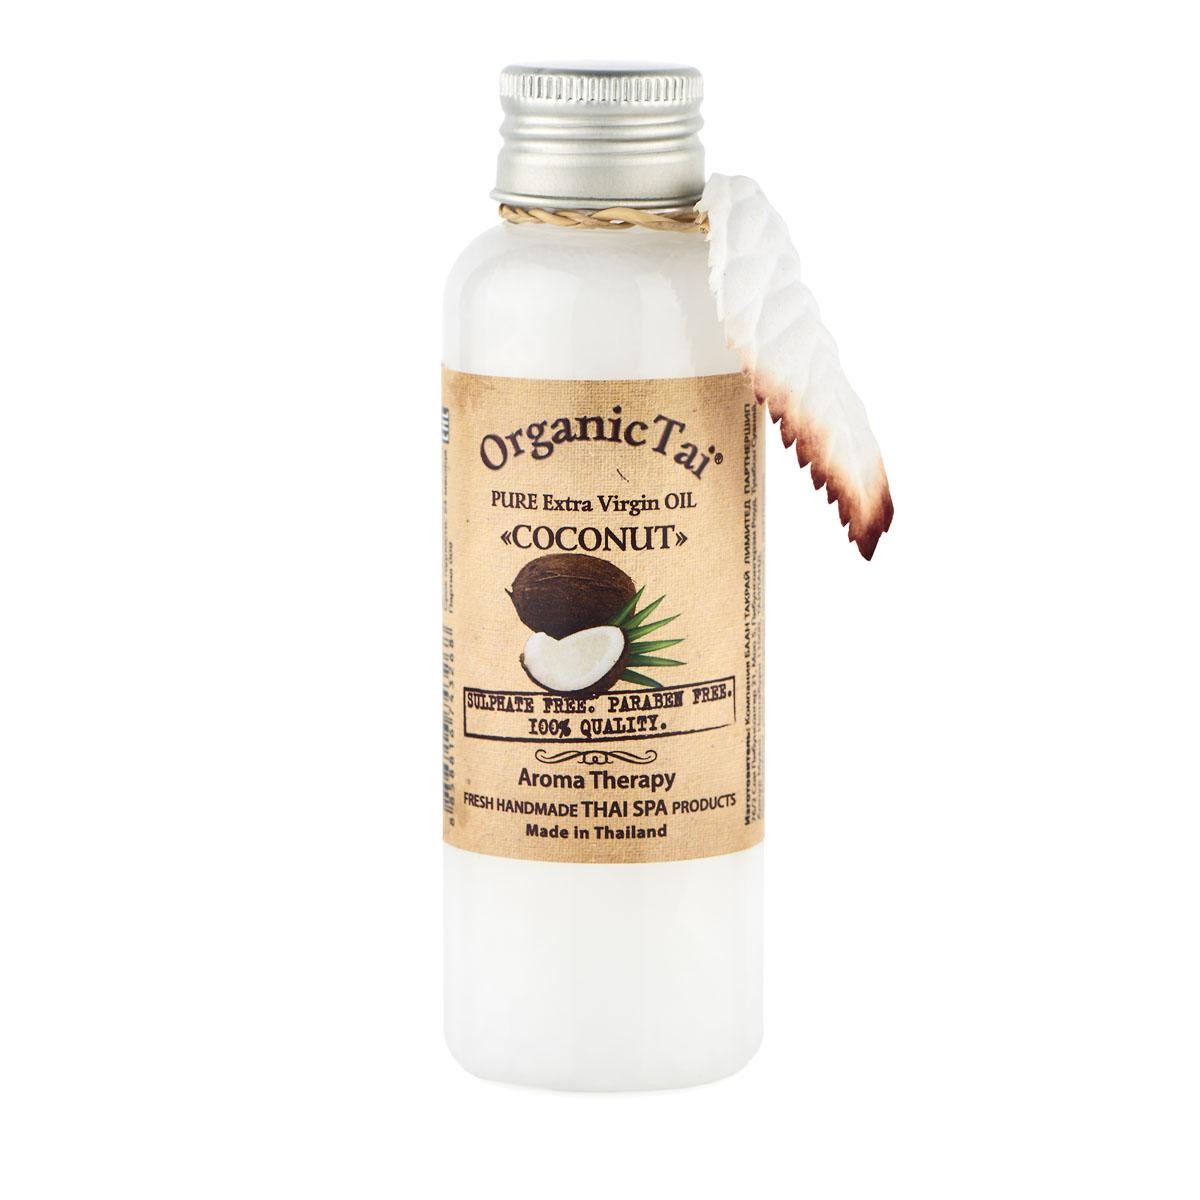 OrganicTai Чистое базовое масло КОКОСА холодного отжима, 120 мл organictai чистое базовое масло кокоса холодного отжима 1000 мл